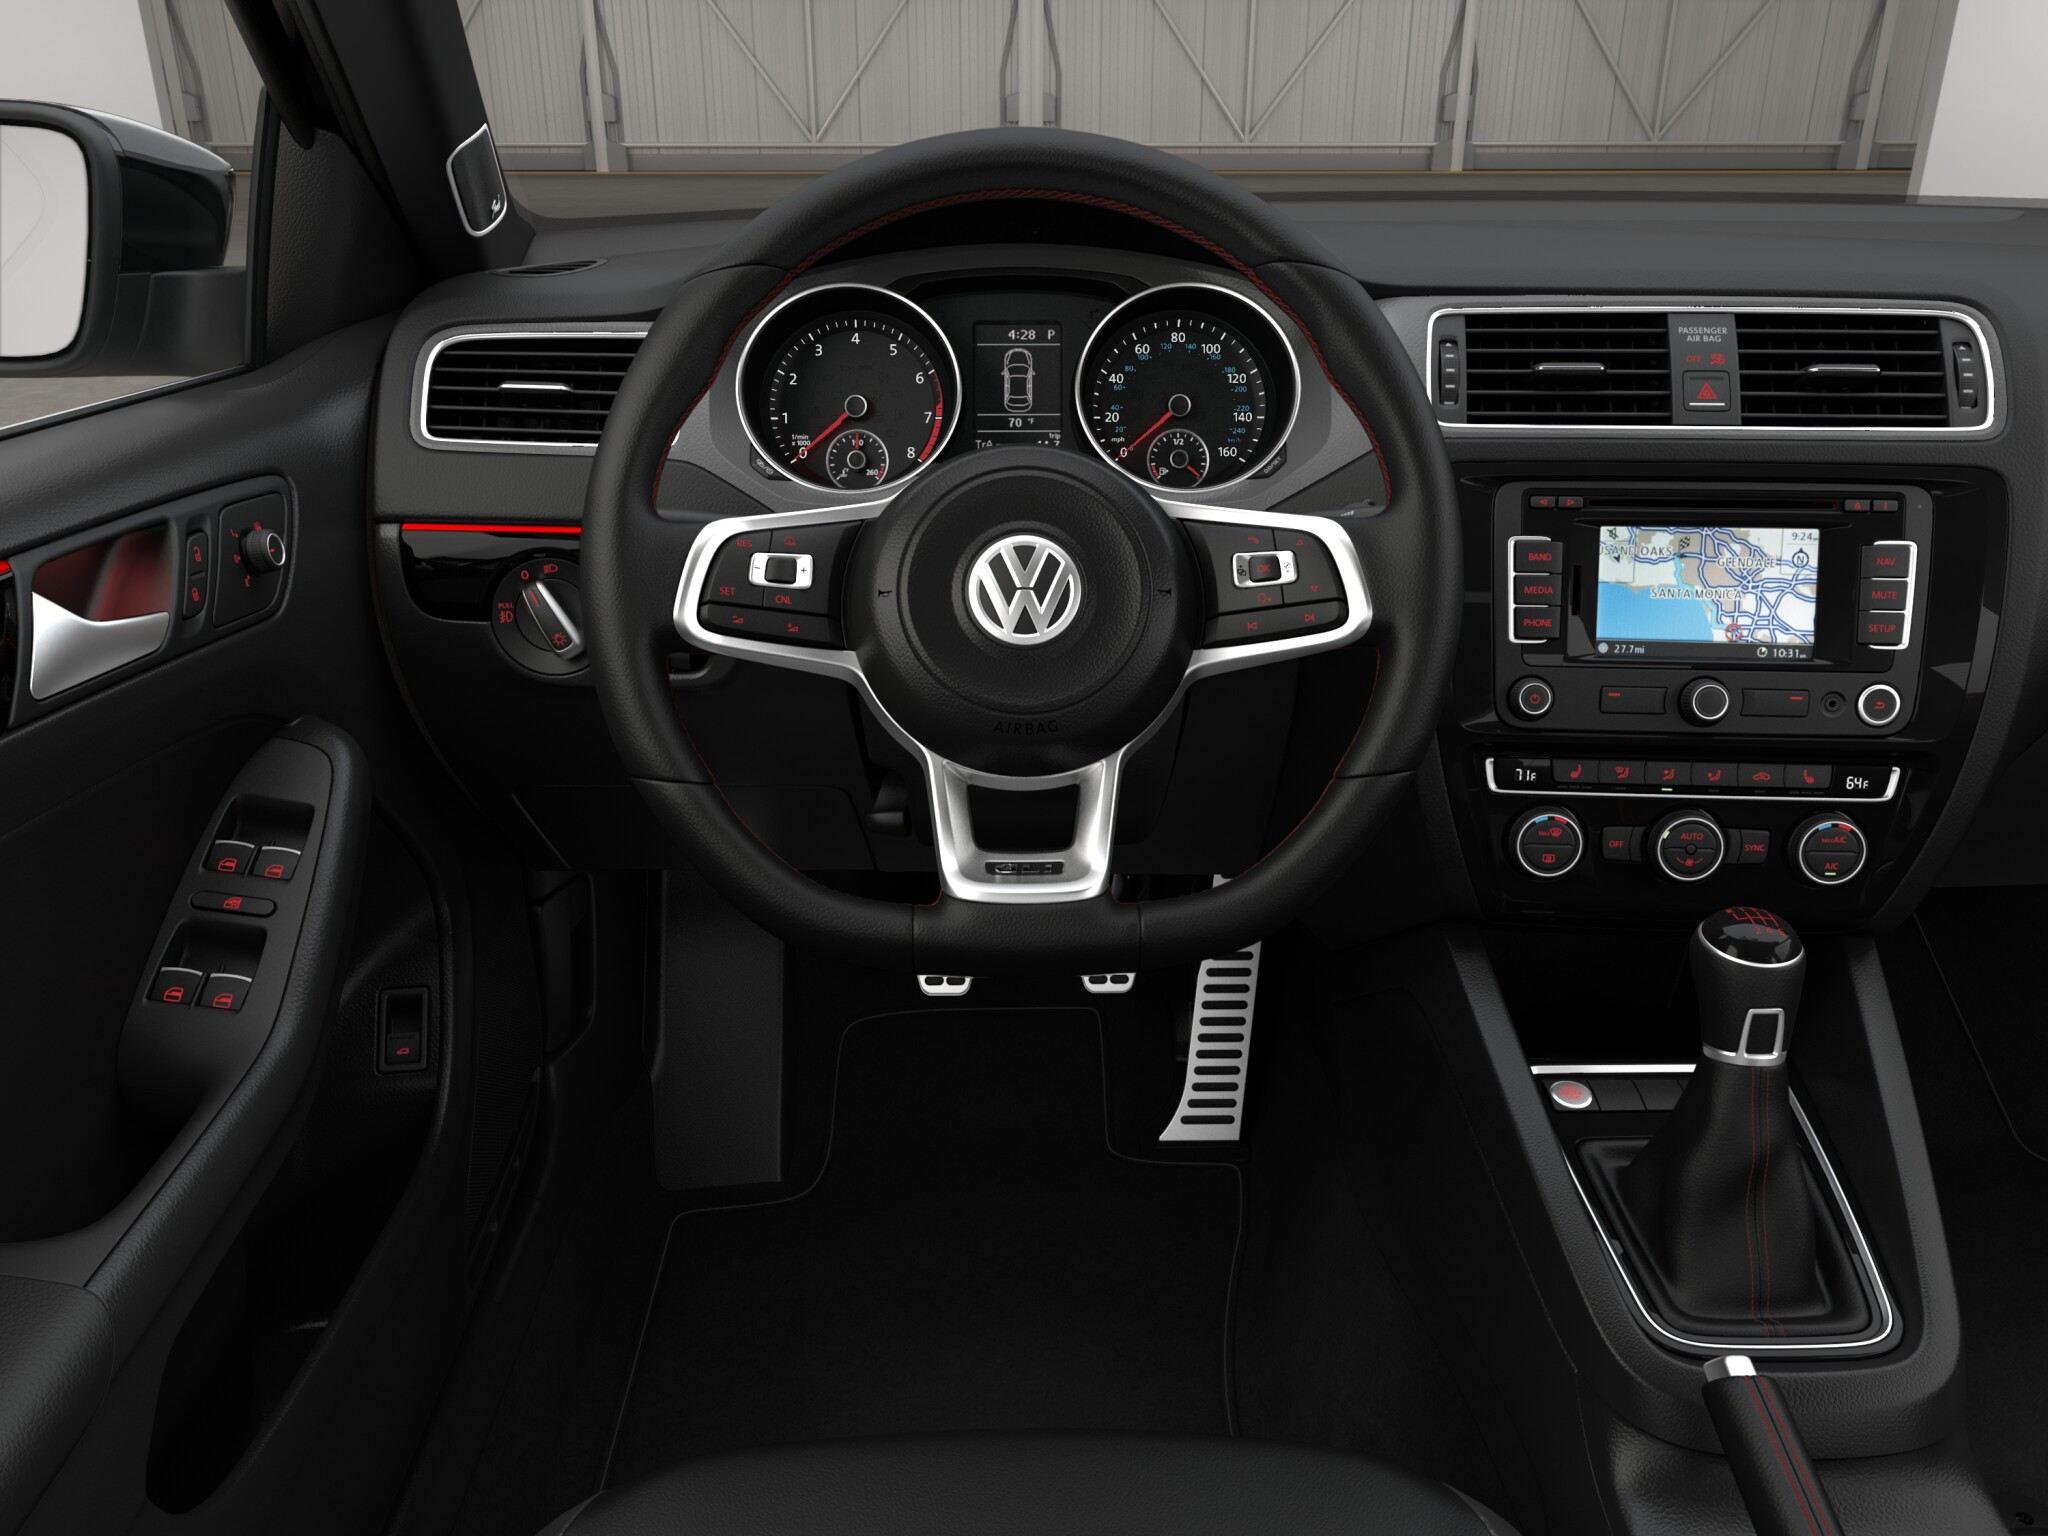 Volkswagen Announces 2016 Jetta GLI -- Larry Roesch Volkswagen | PRLog